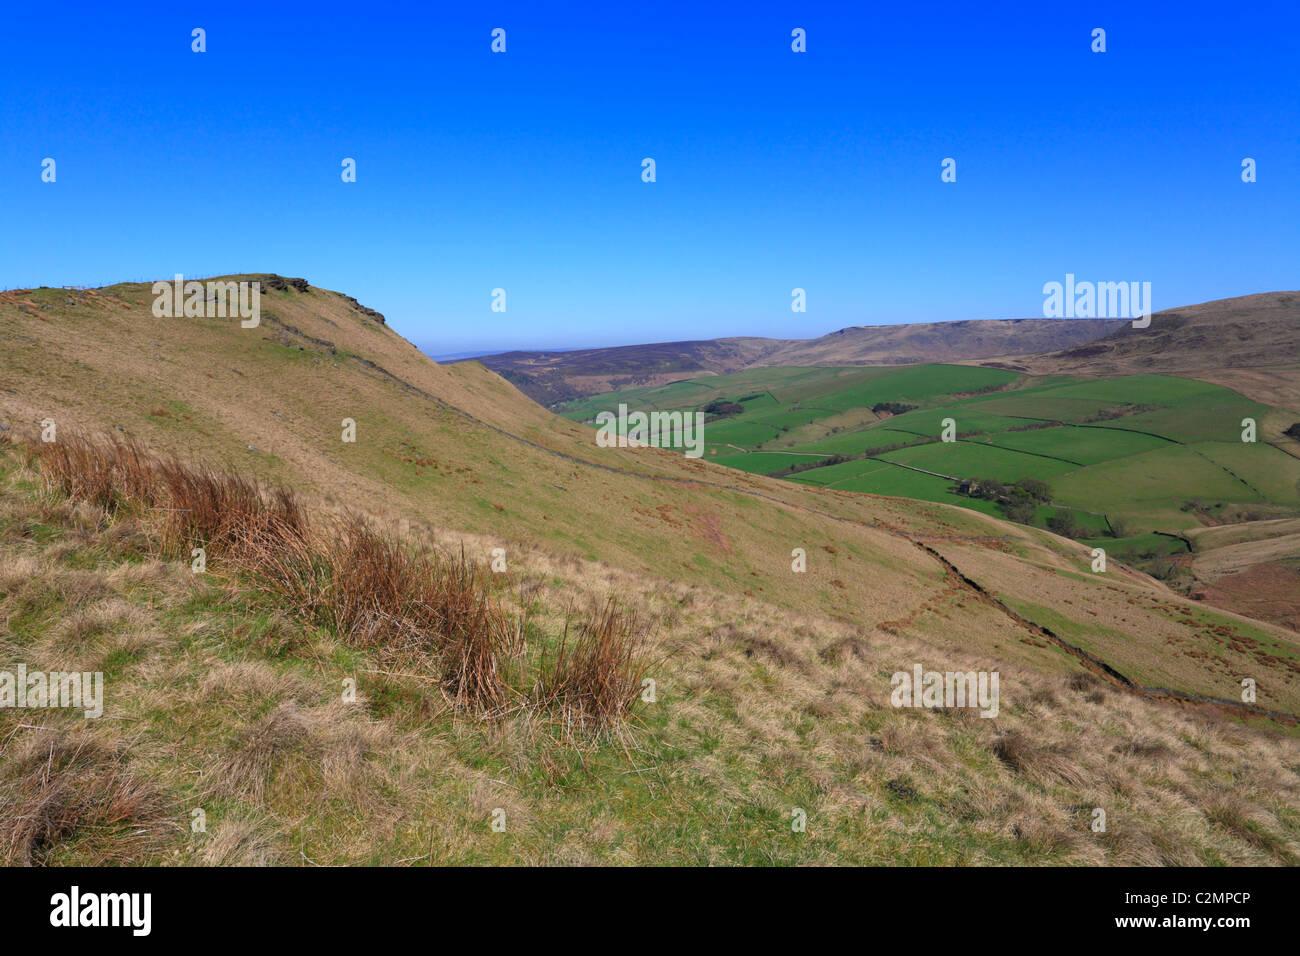 Mount Famine and distant Kinder Scout, Hayfield, Derbyshire, Peak District National Park, England, UK. - Stock Image